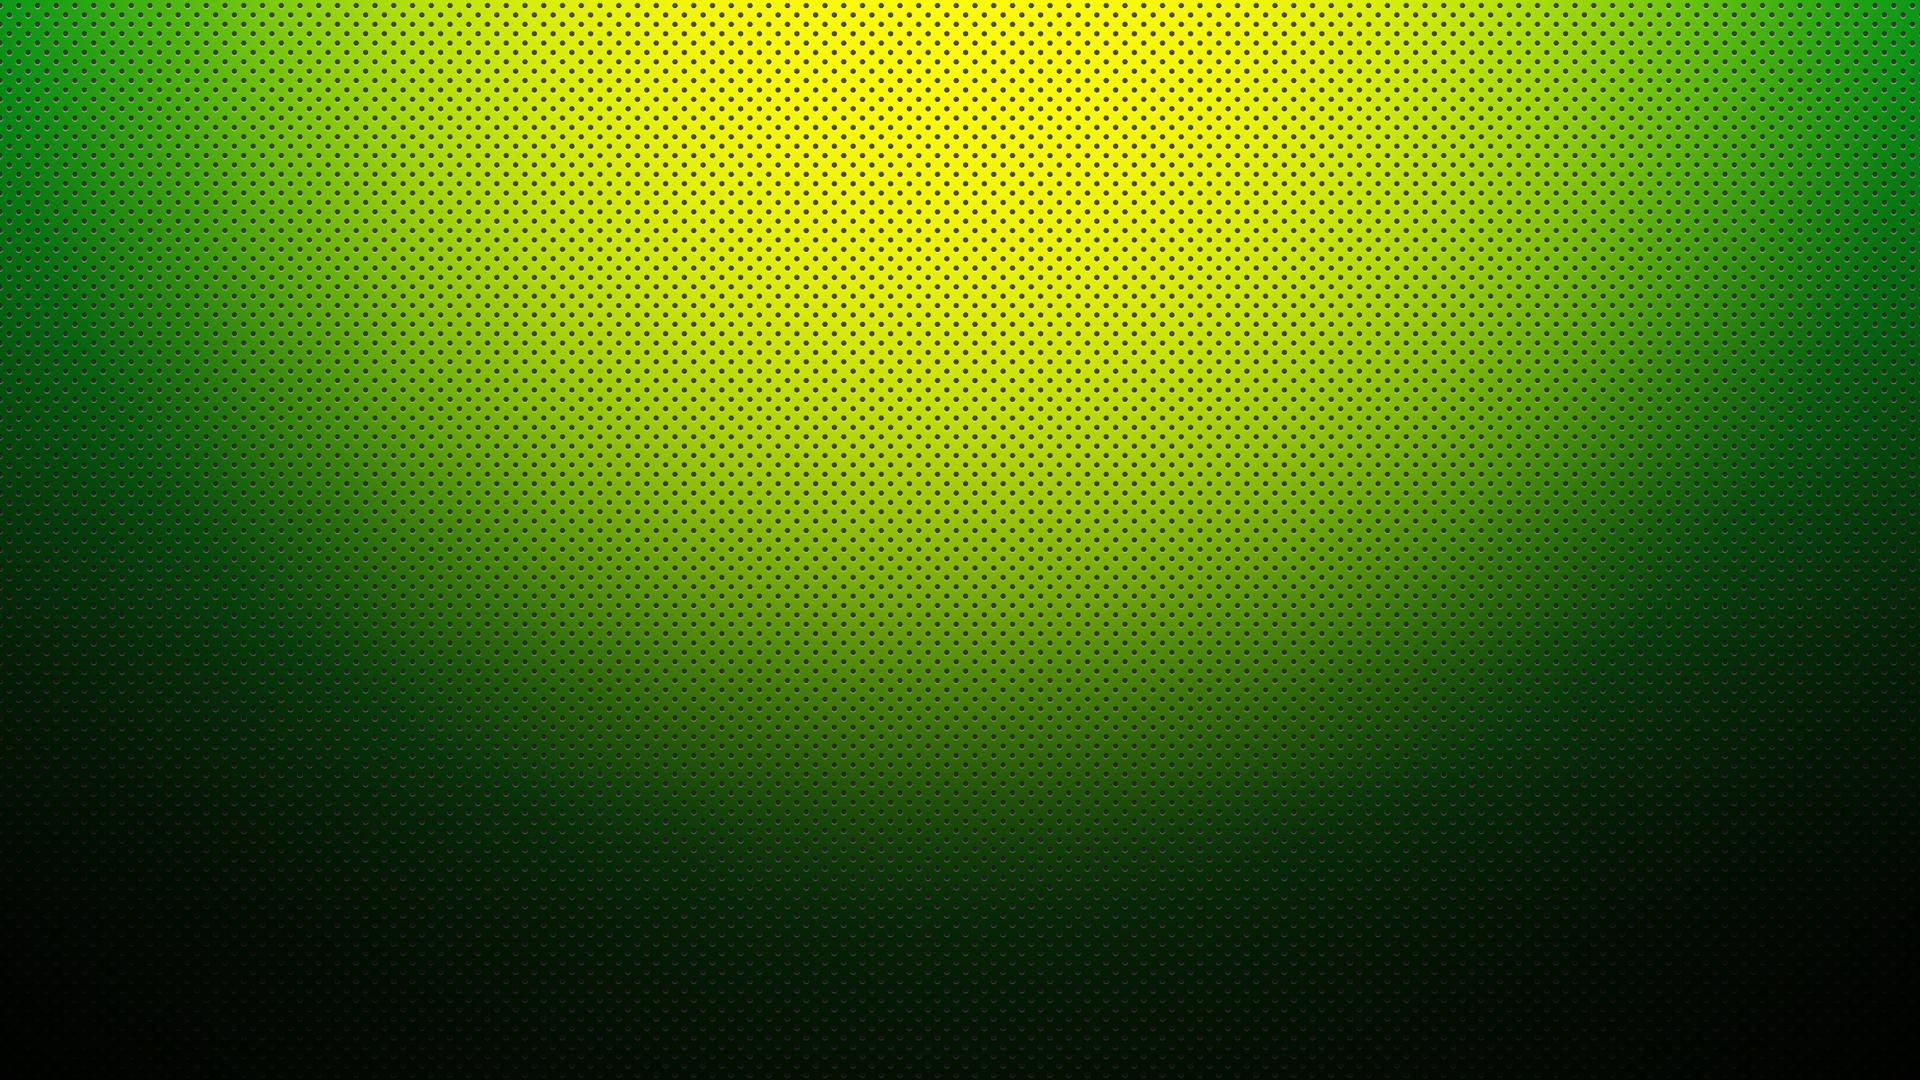 Pattern Backgrounds 18344 1920x1080 px ~ HDWallSource.com